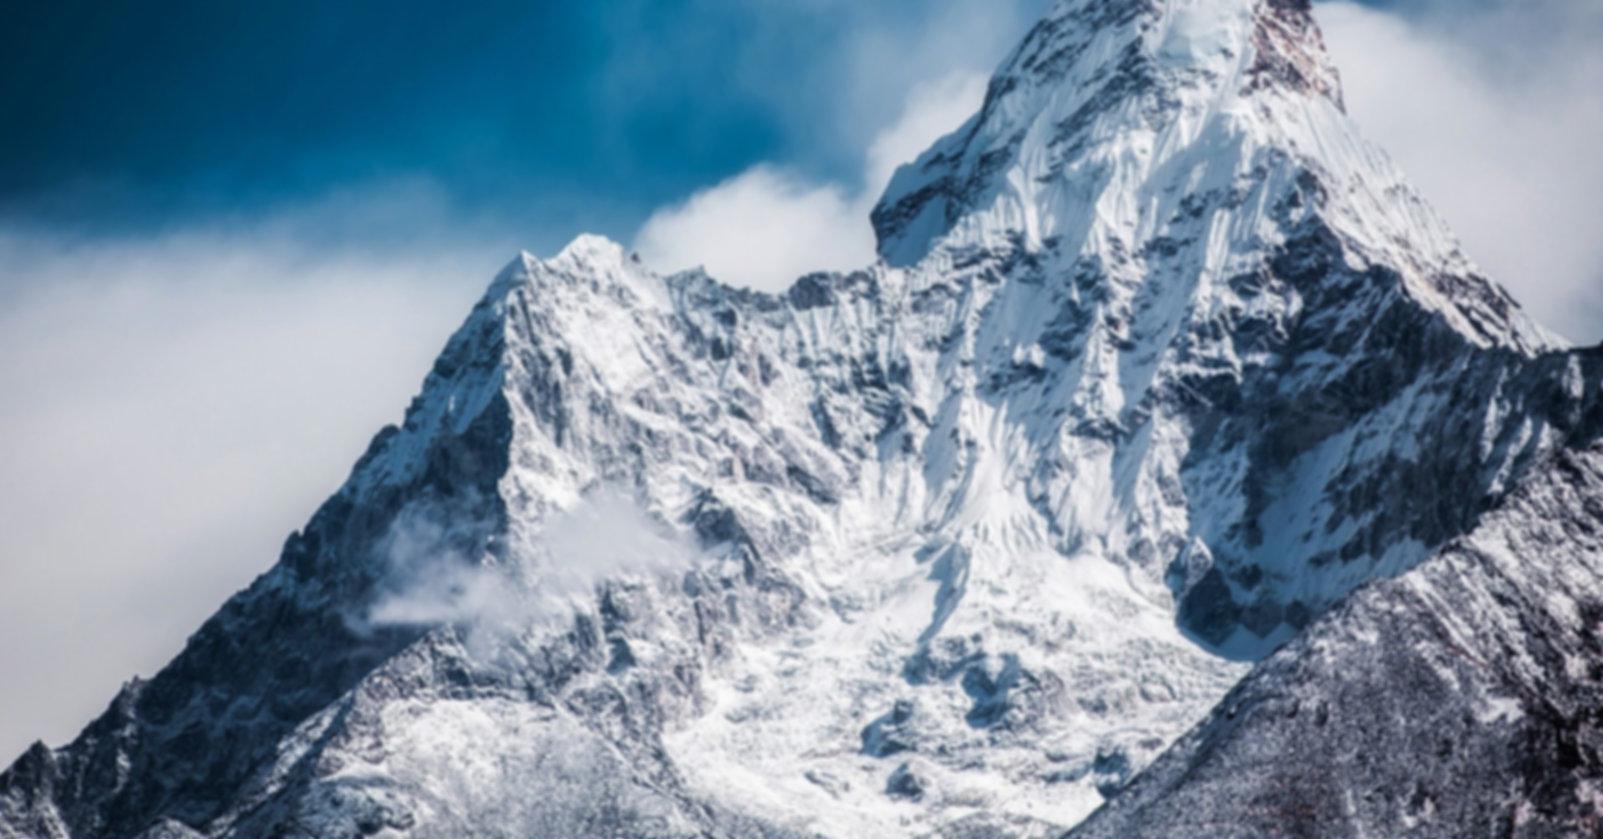 ama-dablam-mountains.jpg